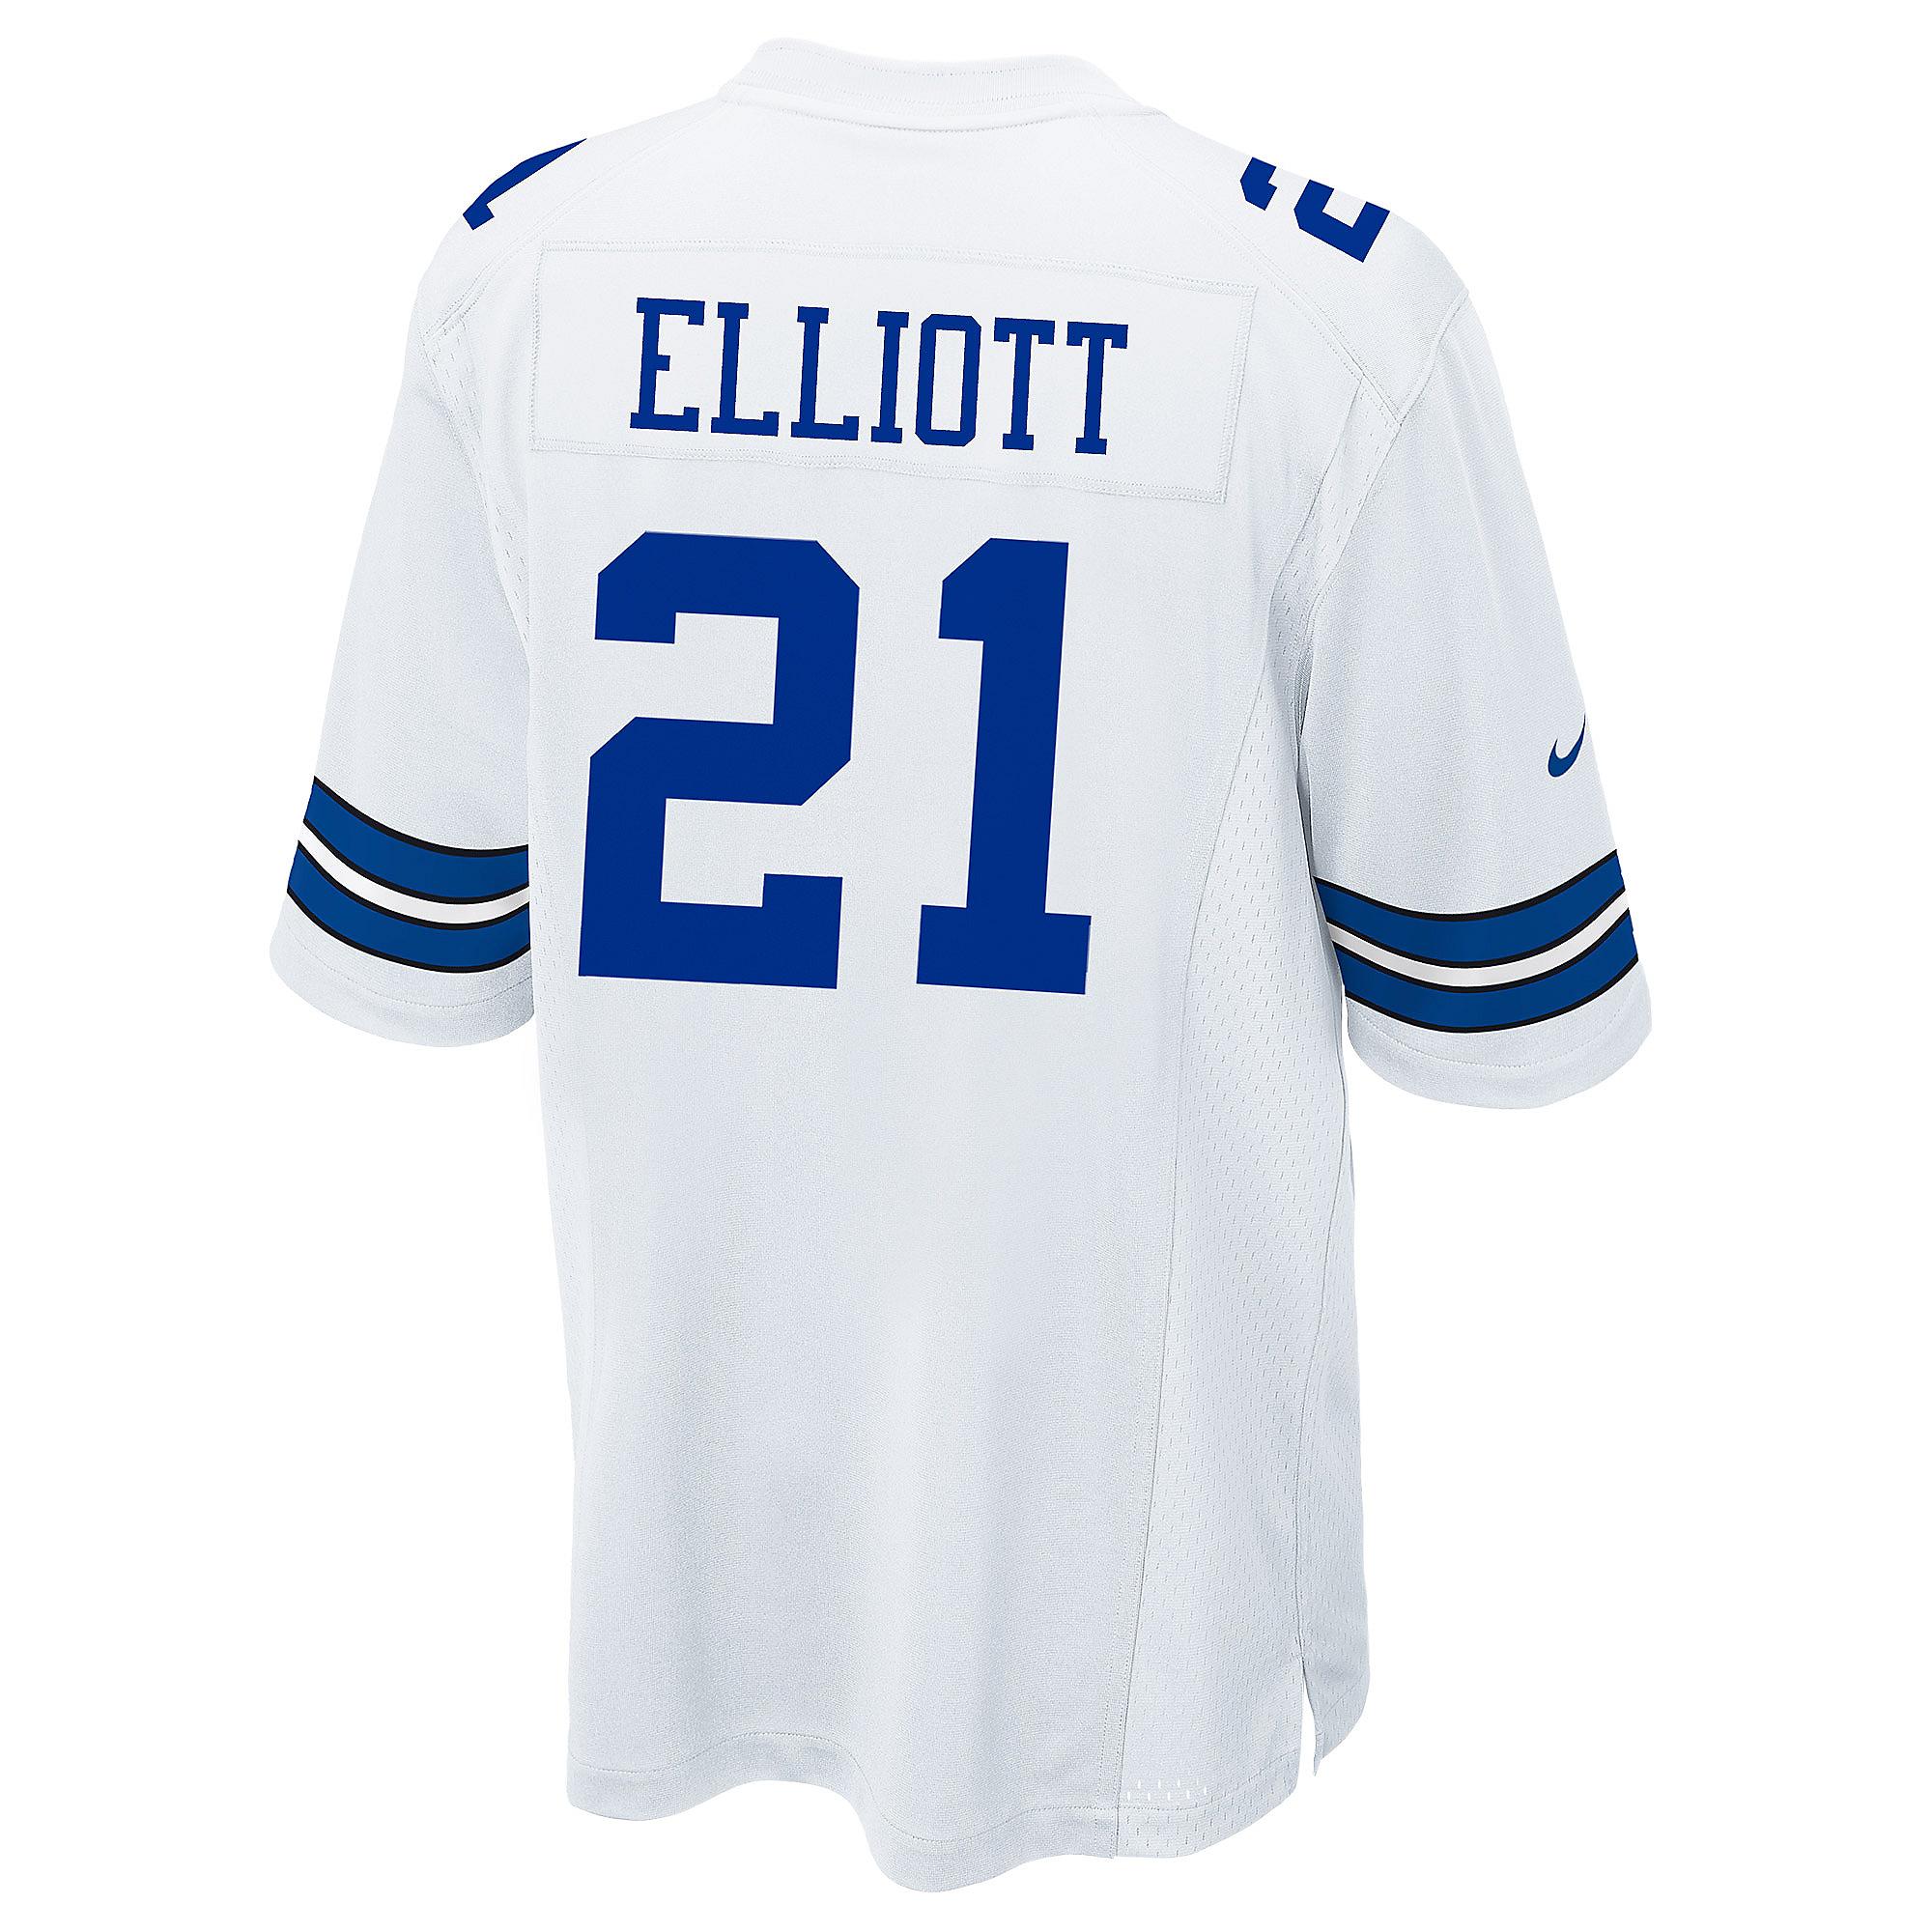 0e3f8251b Dallas Cowboys Ezekiel Elliott Nike White Game Replica Jersey ...